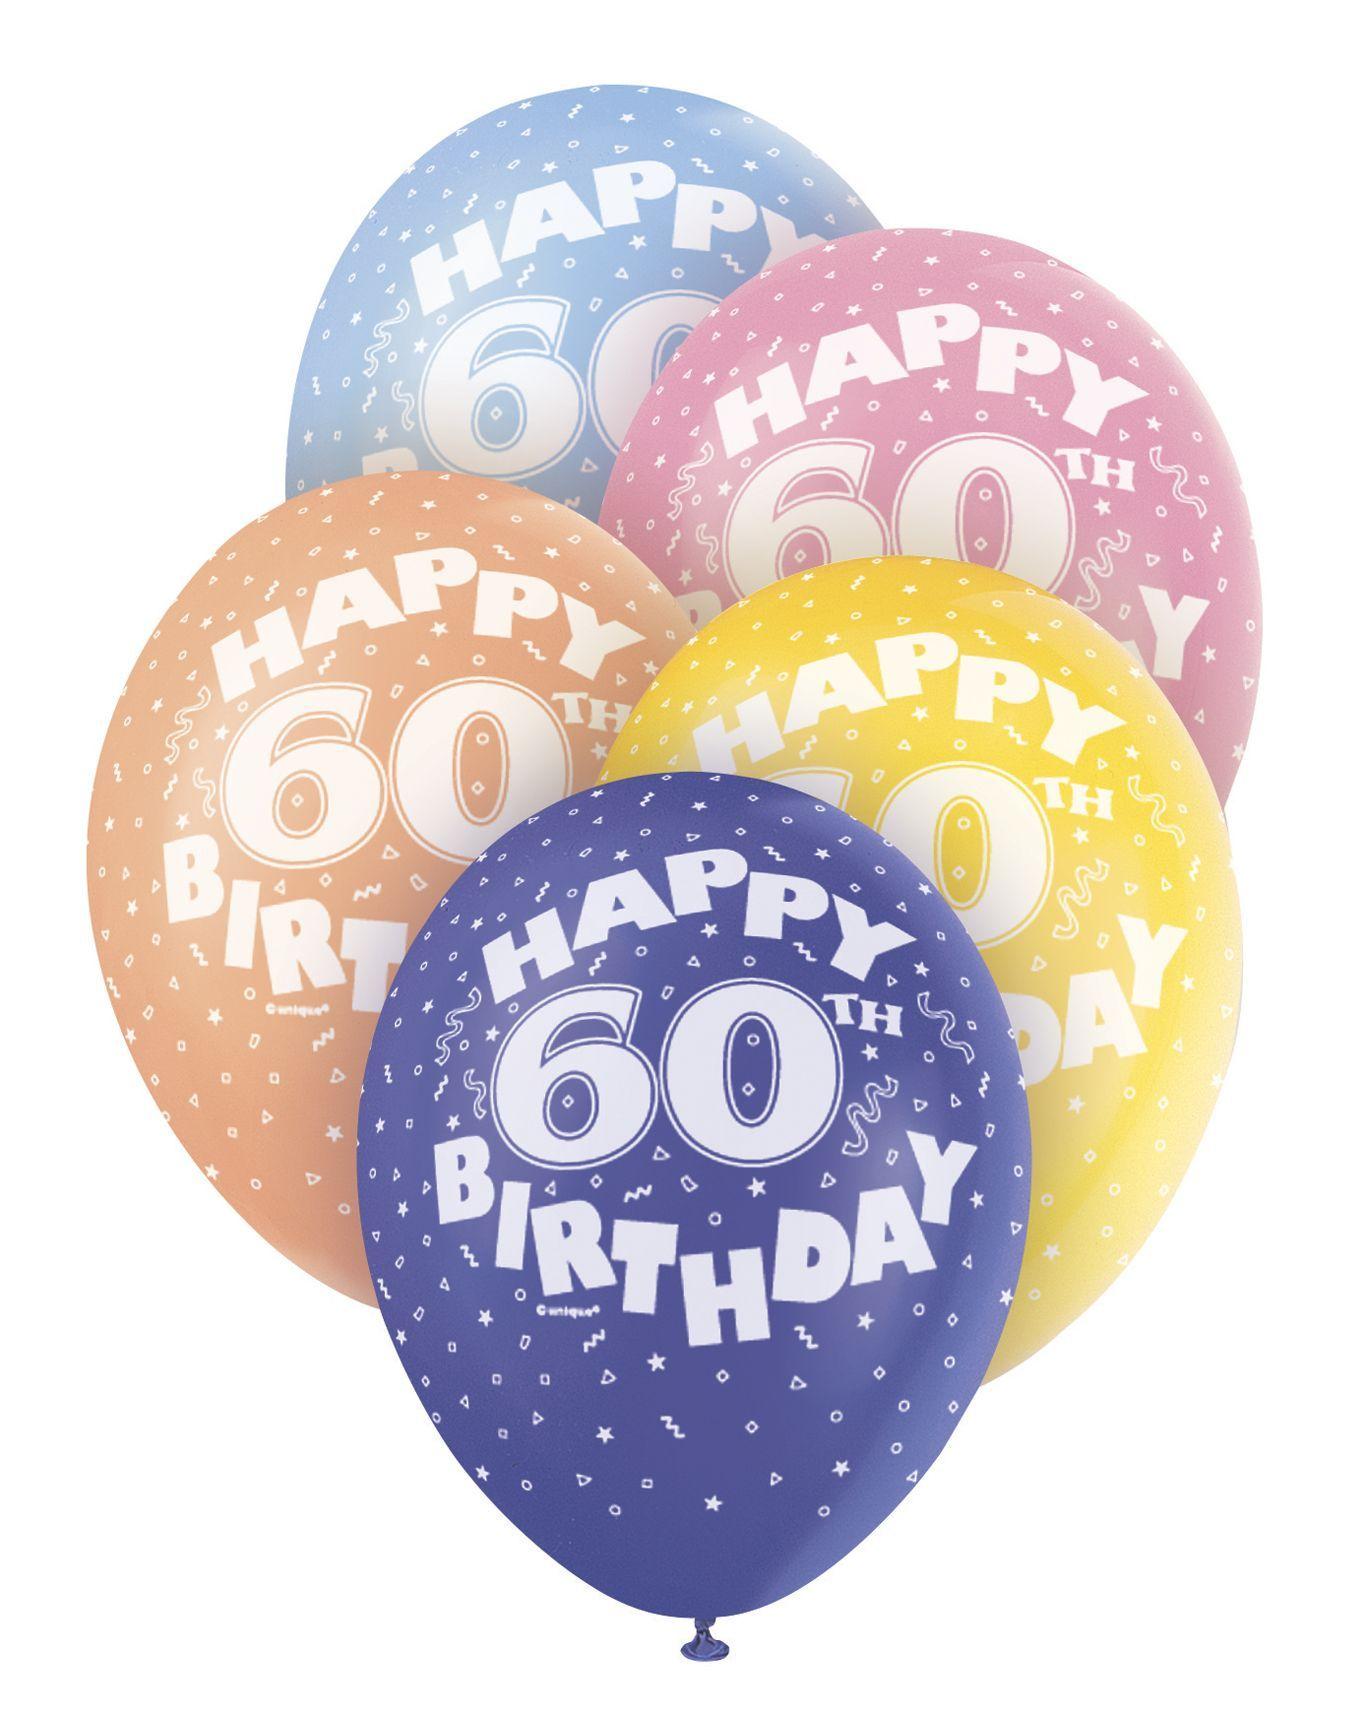 Pearlized Happy 60th Birthday Balloons 5 X 12 Colours May Vary